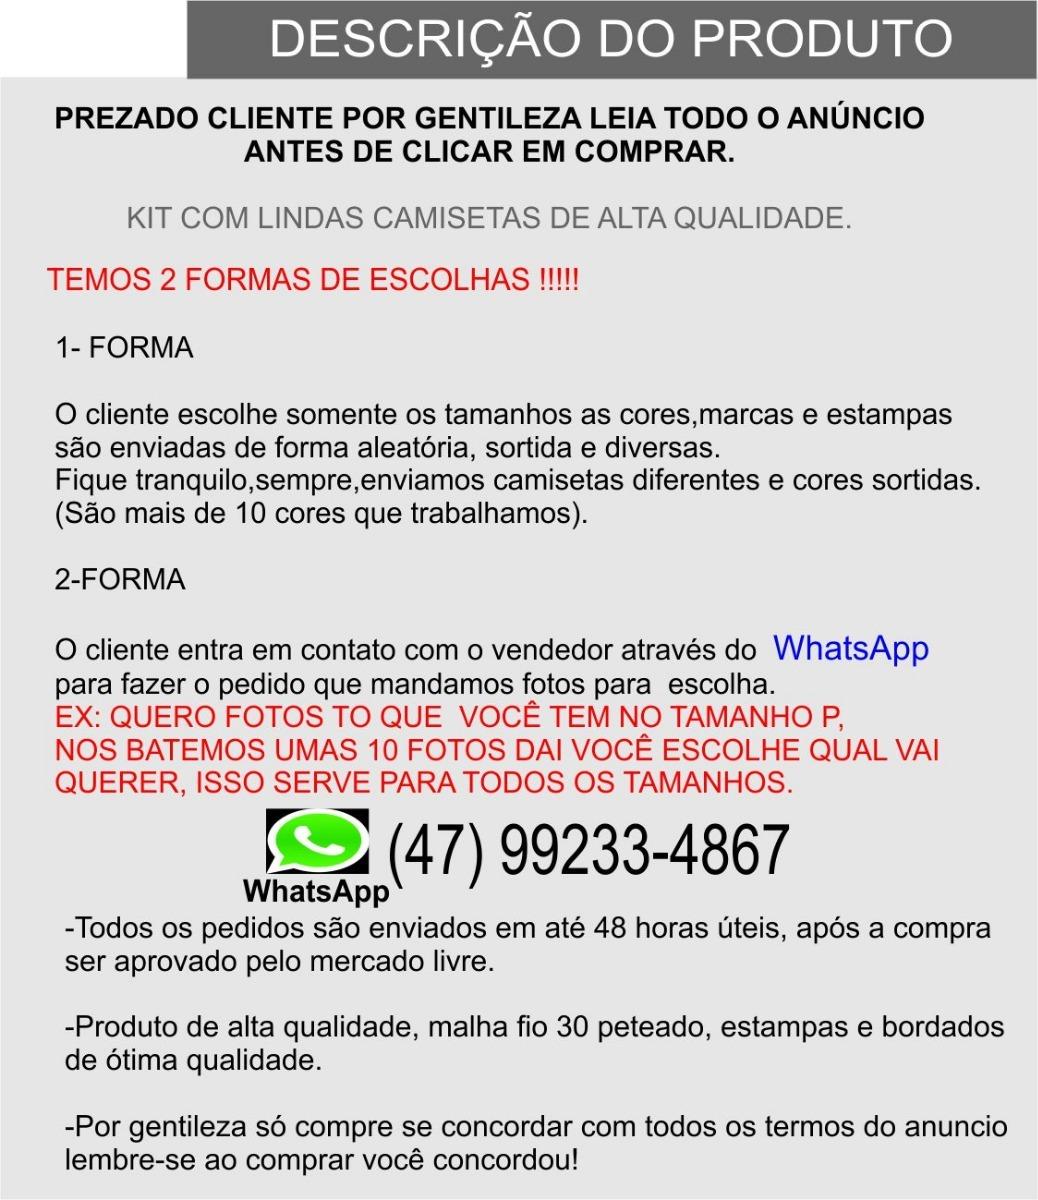 Kit C 10 Camisetas Mas Diversas Marcas Tamanhos G1 G2 G3 - R  229,90 ... 318626e7c8